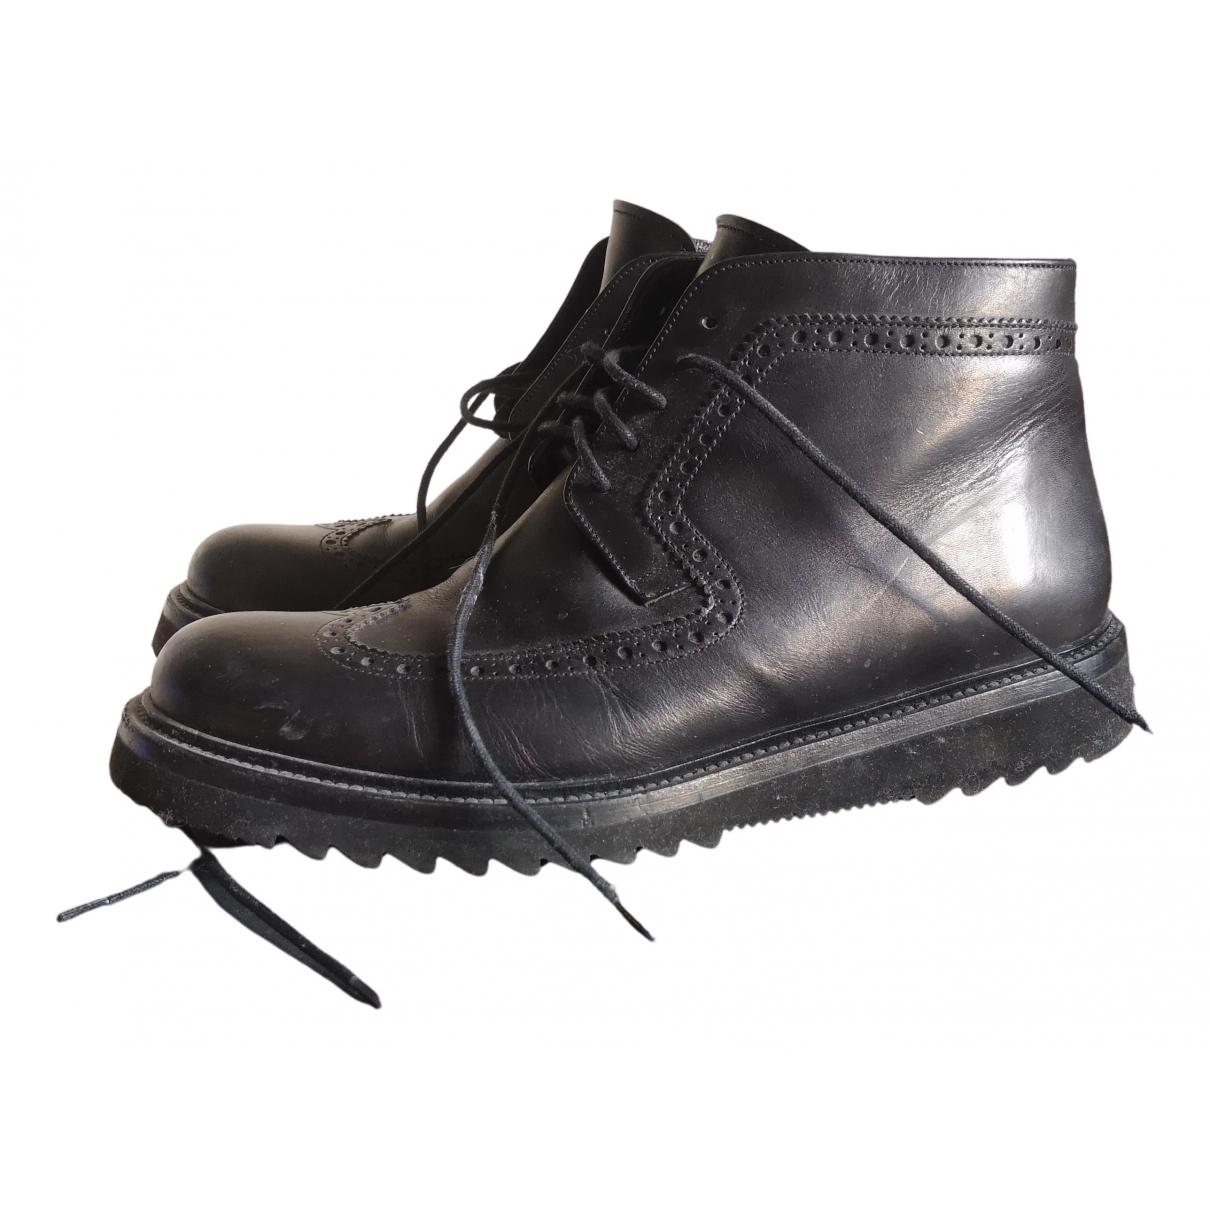 Dior Homme N Black Leather Boots for Men 41.5 EU